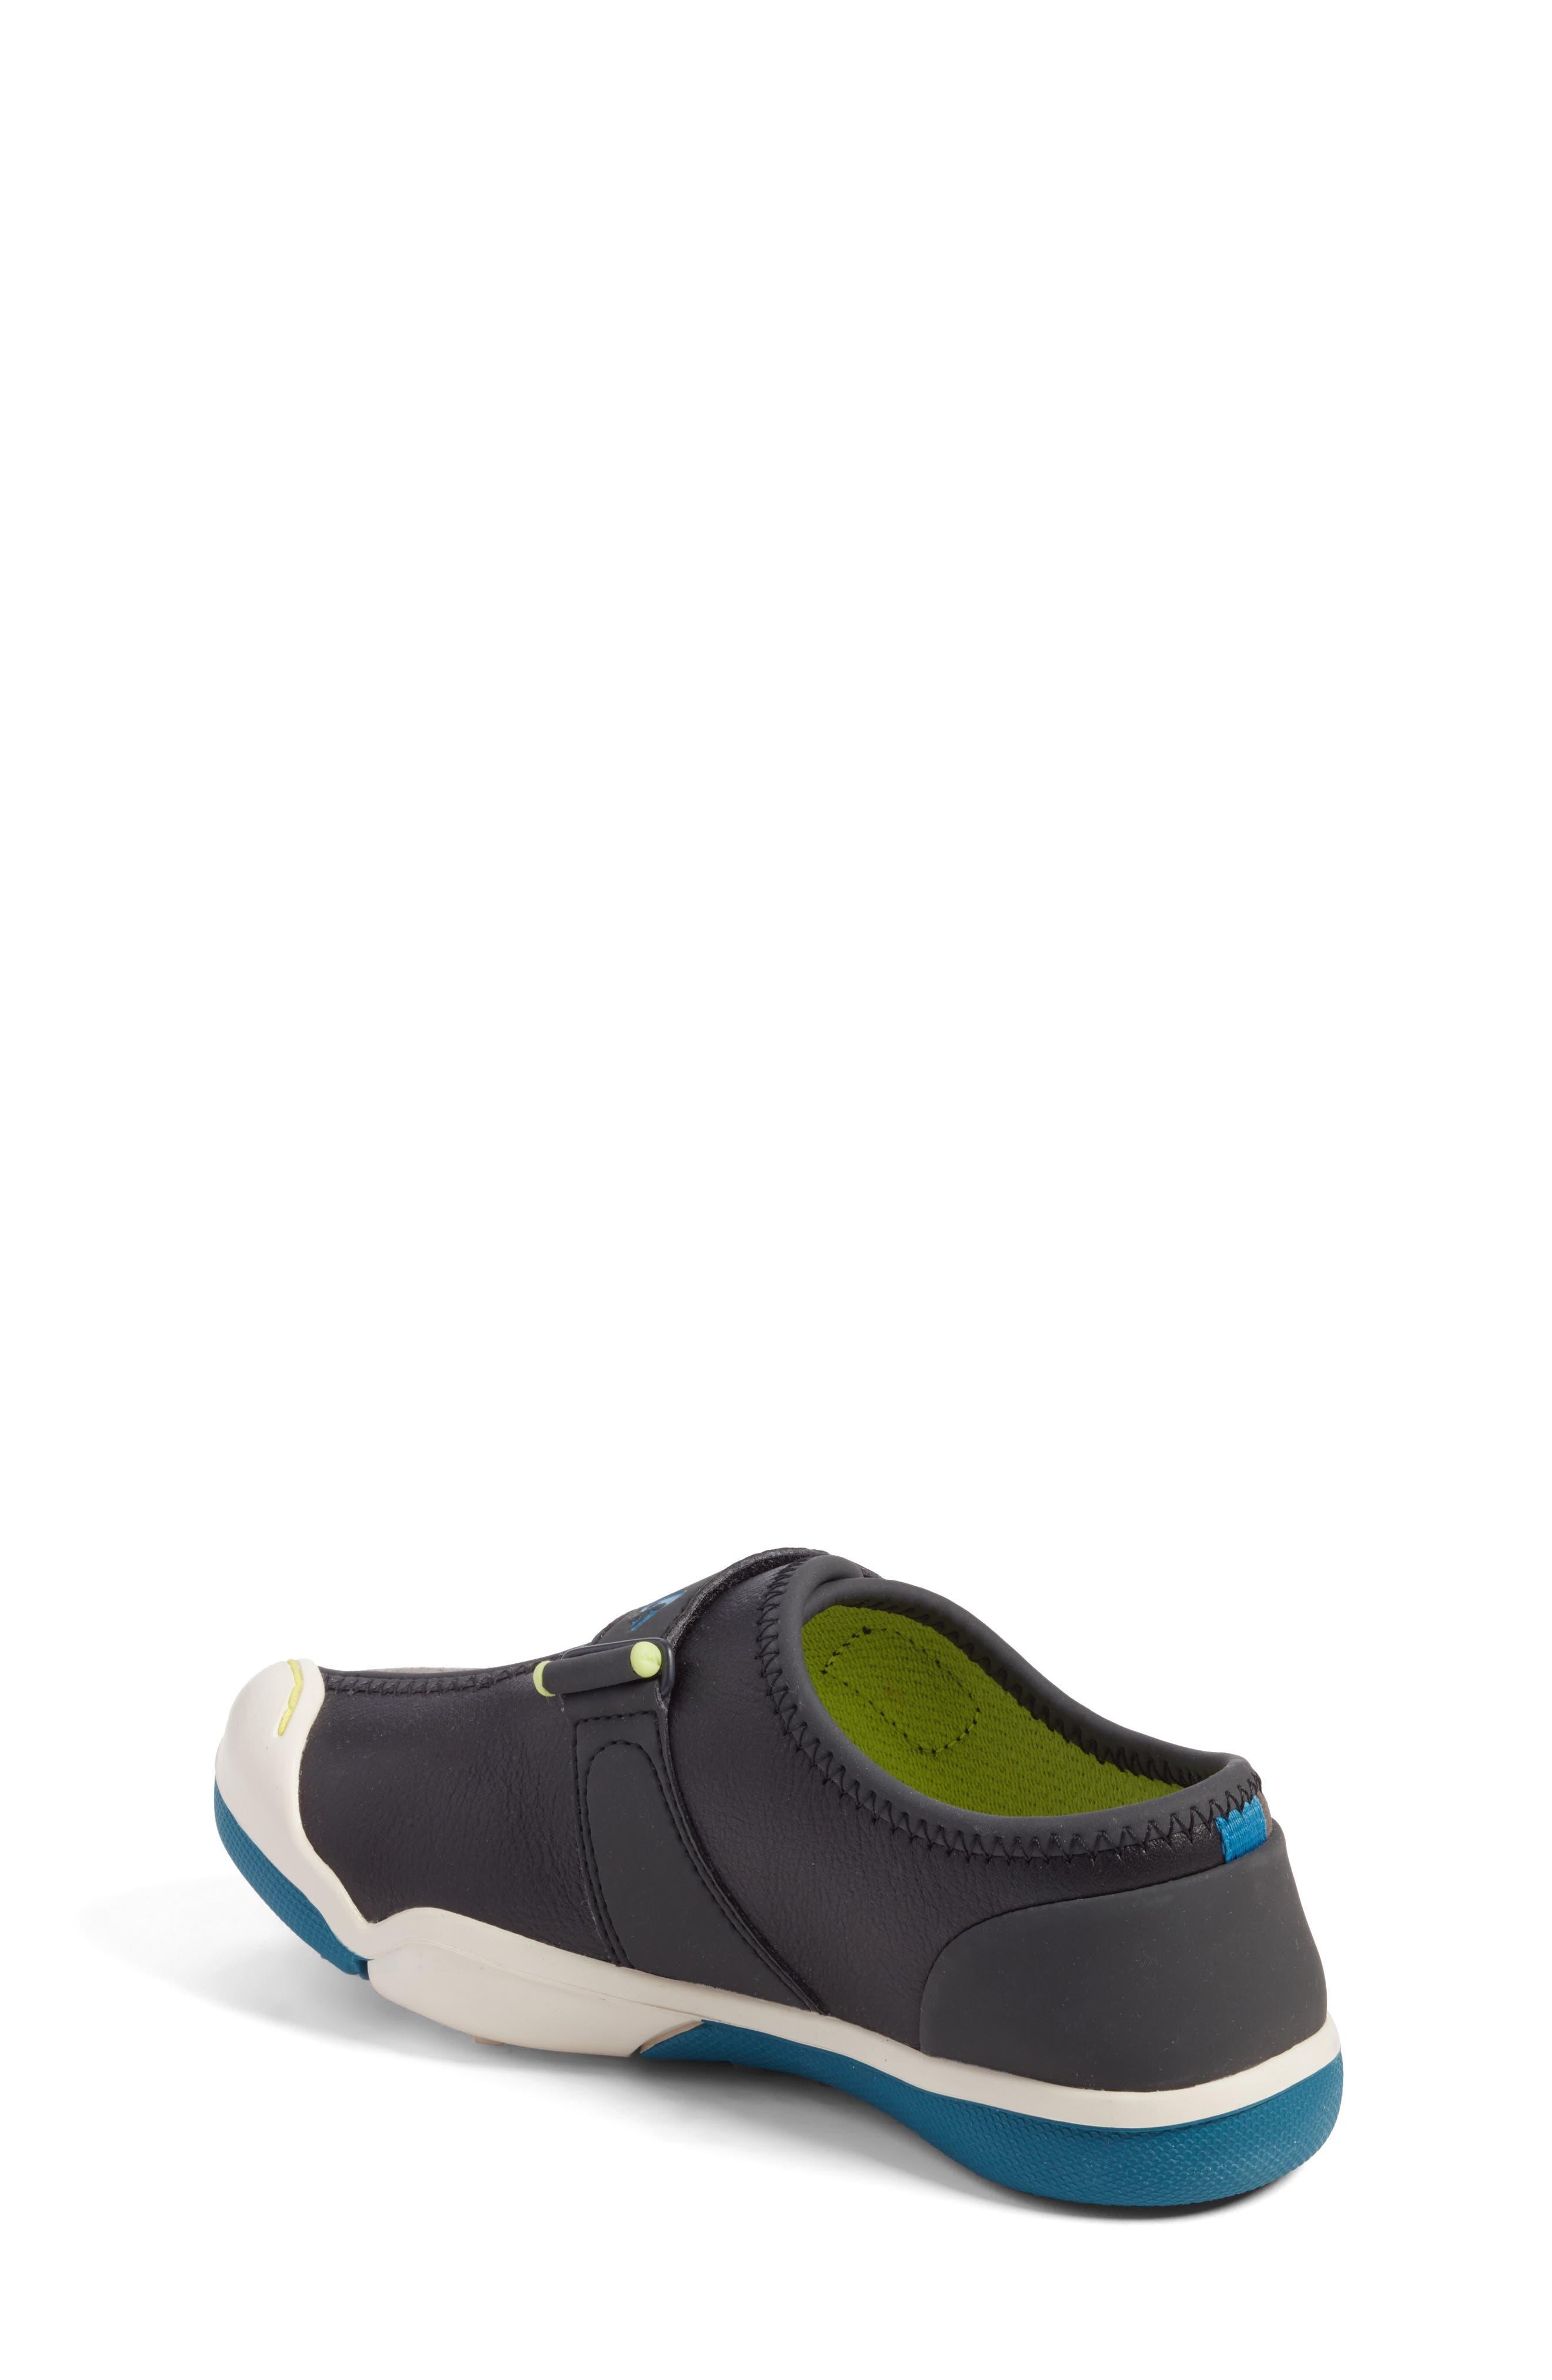 Cam Perforated Sneaker,                             Alternate thumbnail 2, color,                             025